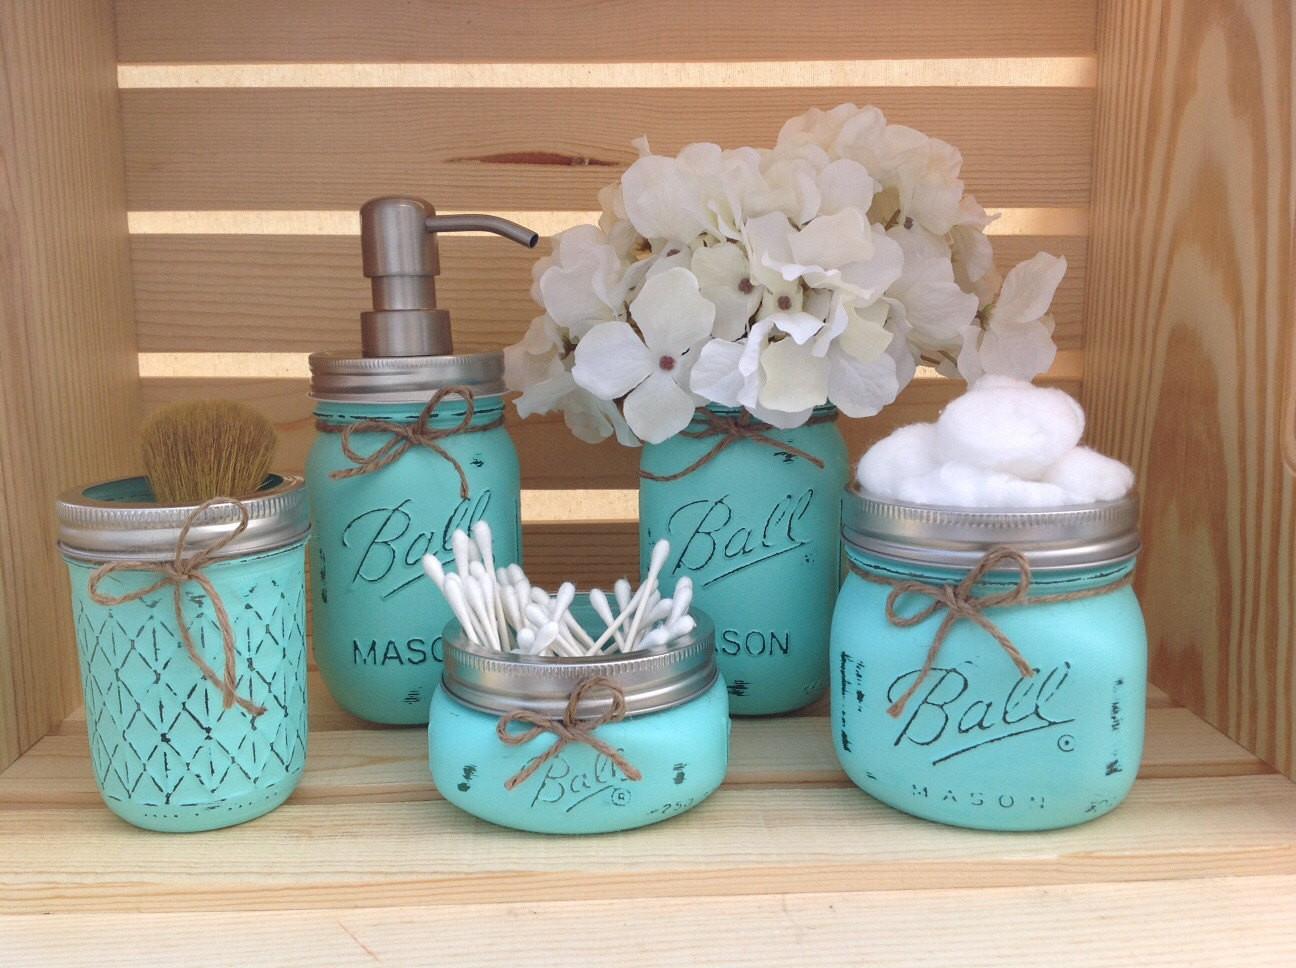 Mason Jar Bathroom Decor Best Of Mason Jar Bathroom Set Mason Jars Bathroom Decor Bridal by